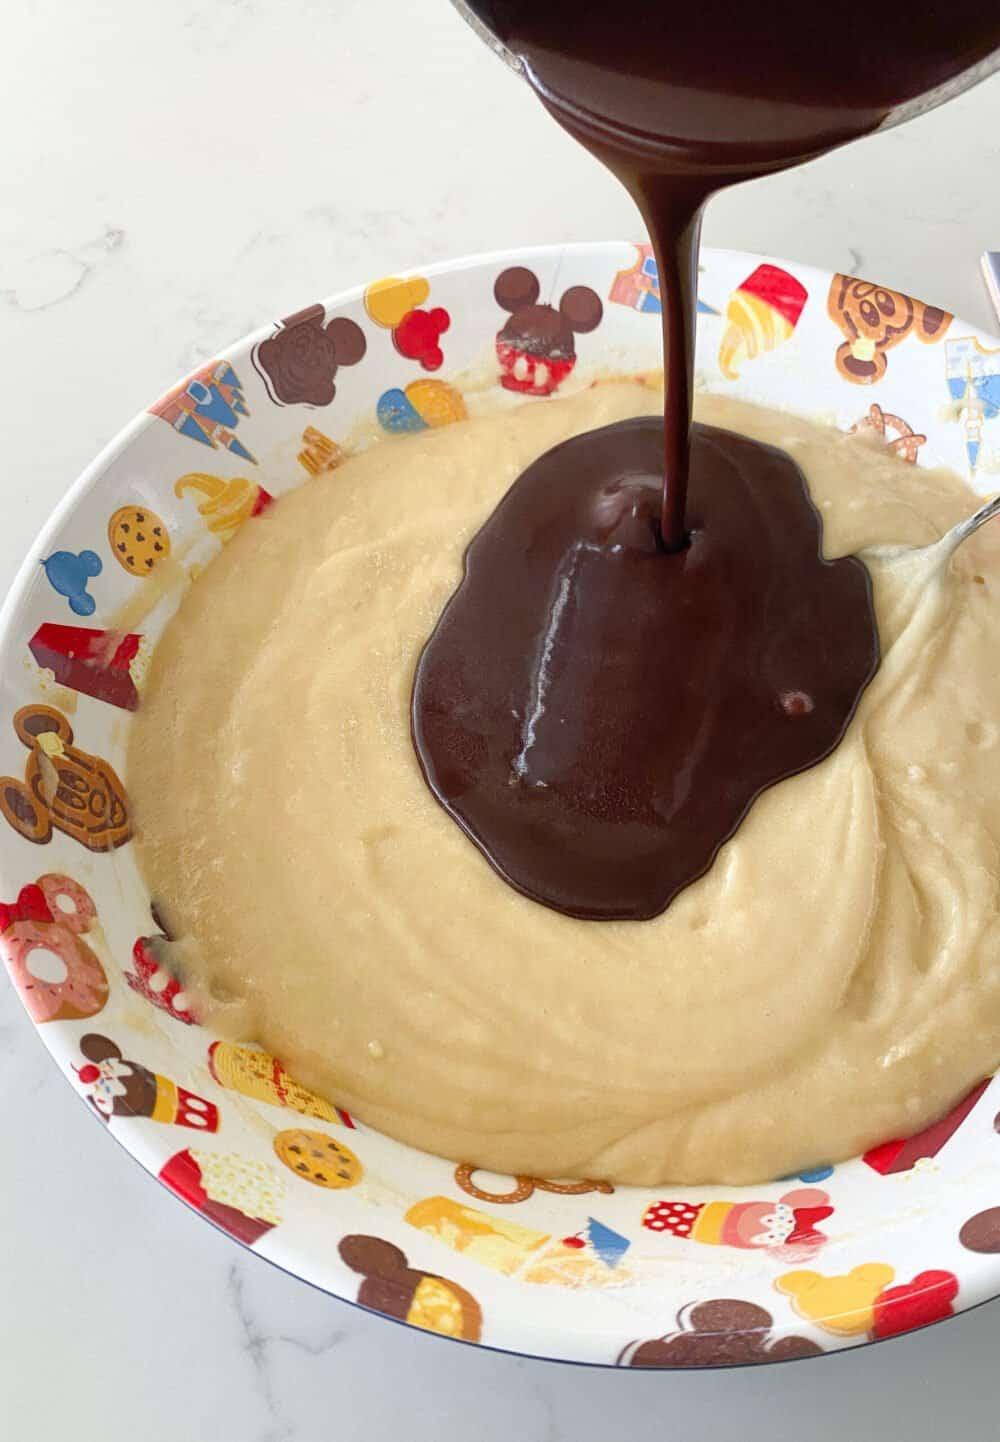 melting chocolate for texas sheet cake